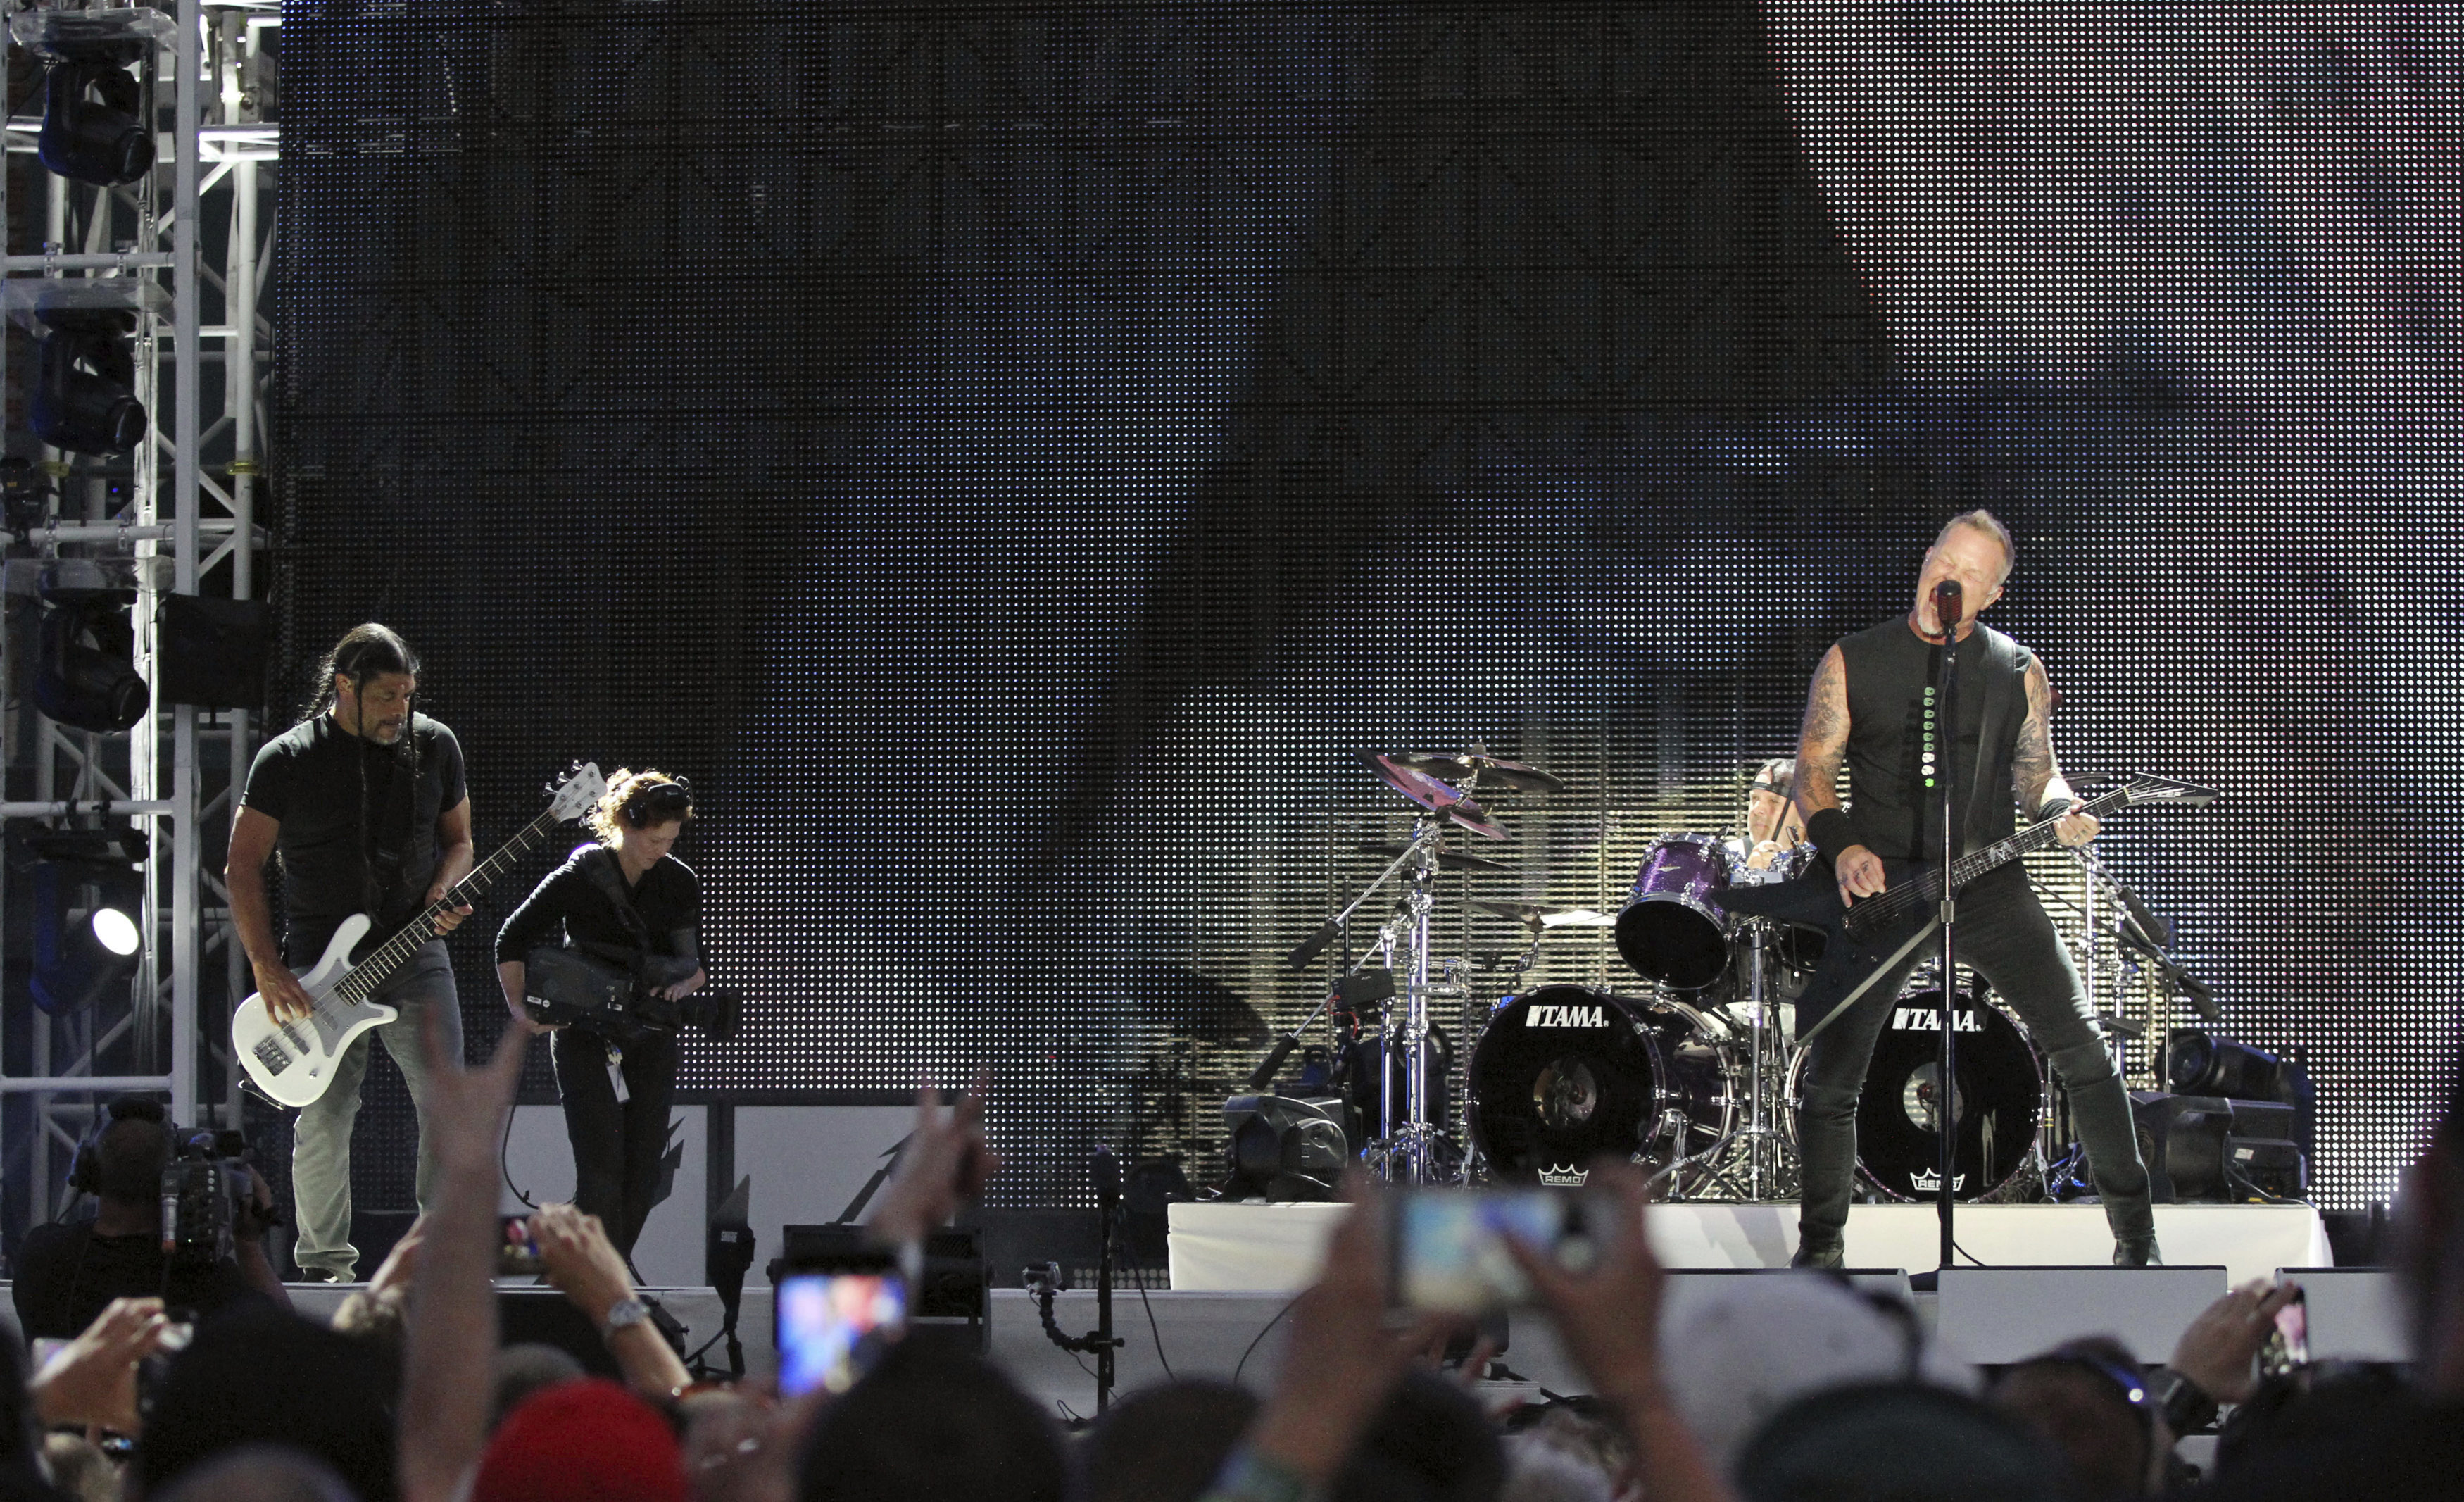 James Hetfield, Lars Ulrich, Kirk Hammett, Robert Trujillo. @Ap